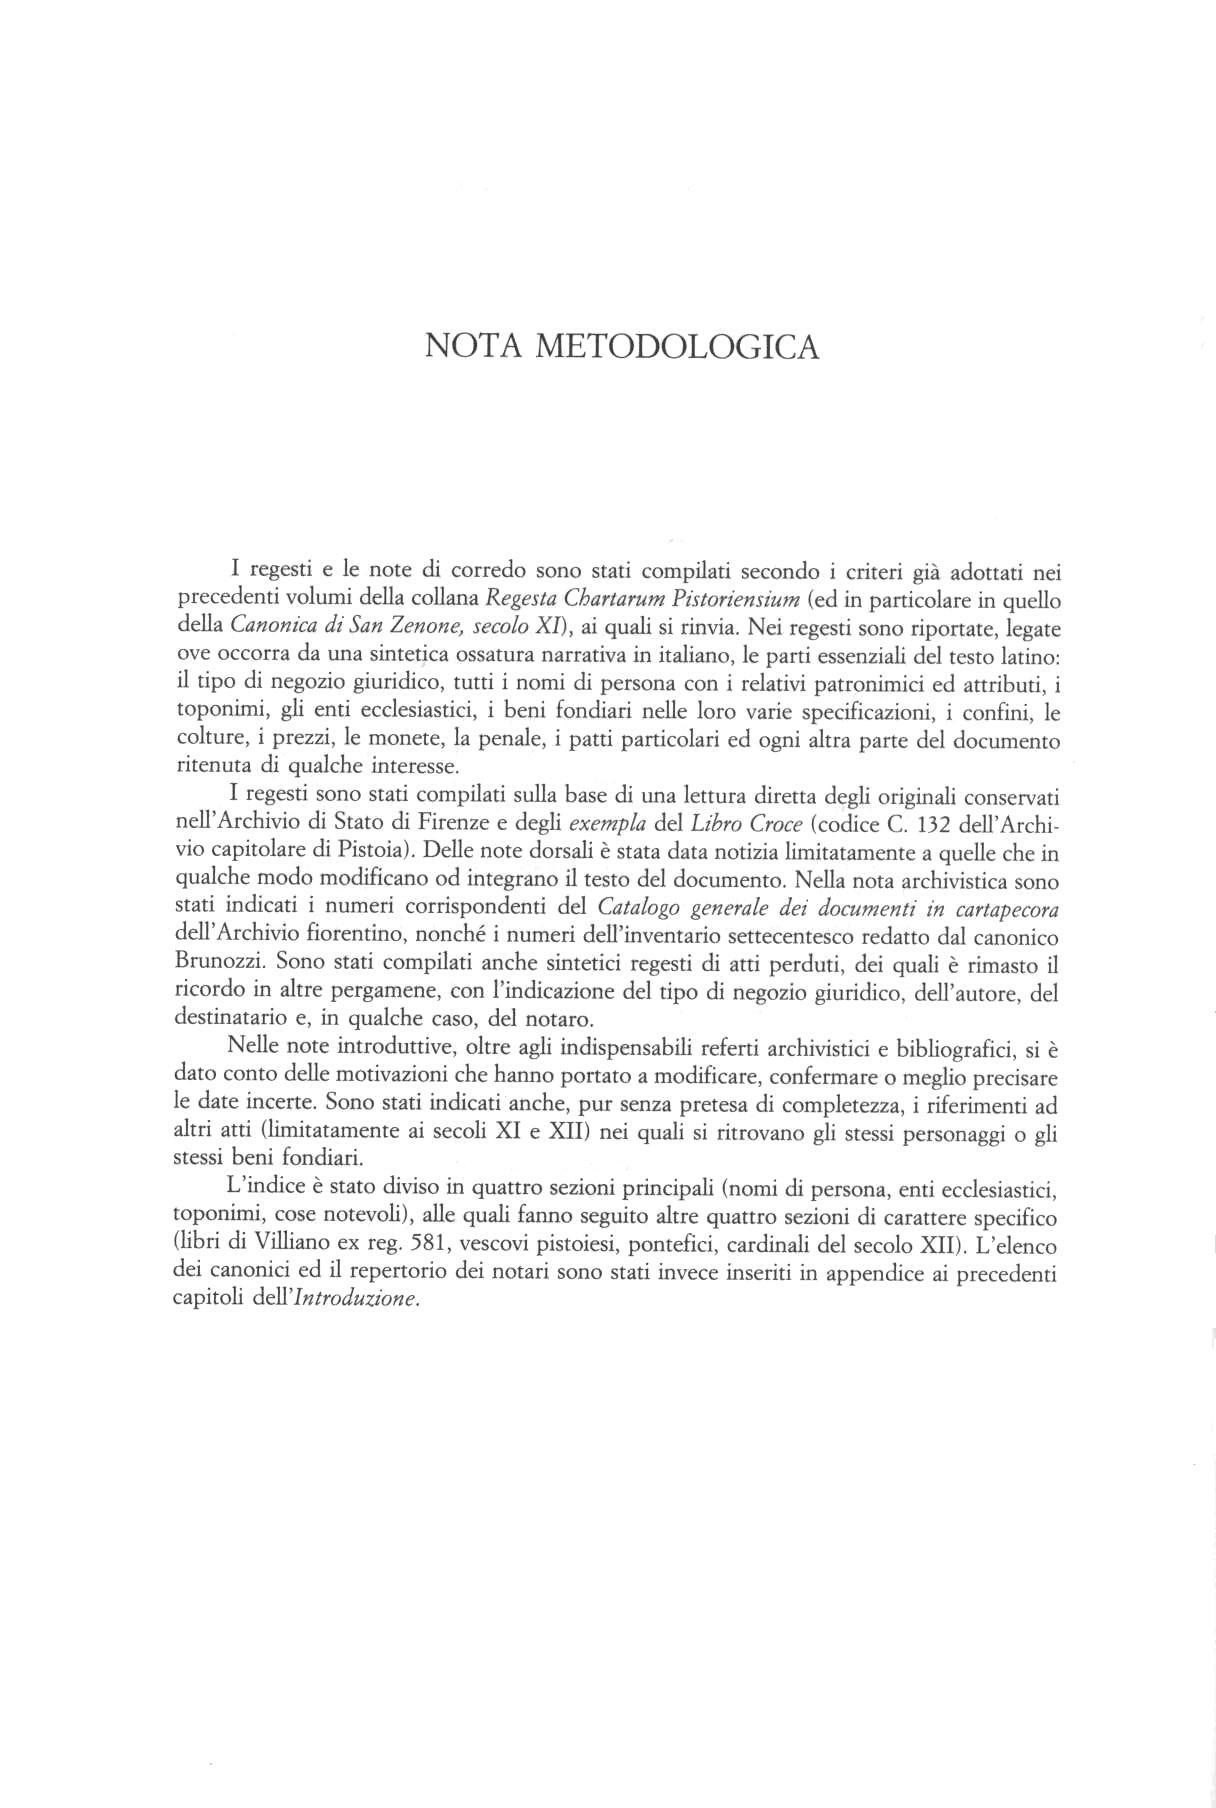 !Canonica S. Zenone XII 00062.jpg